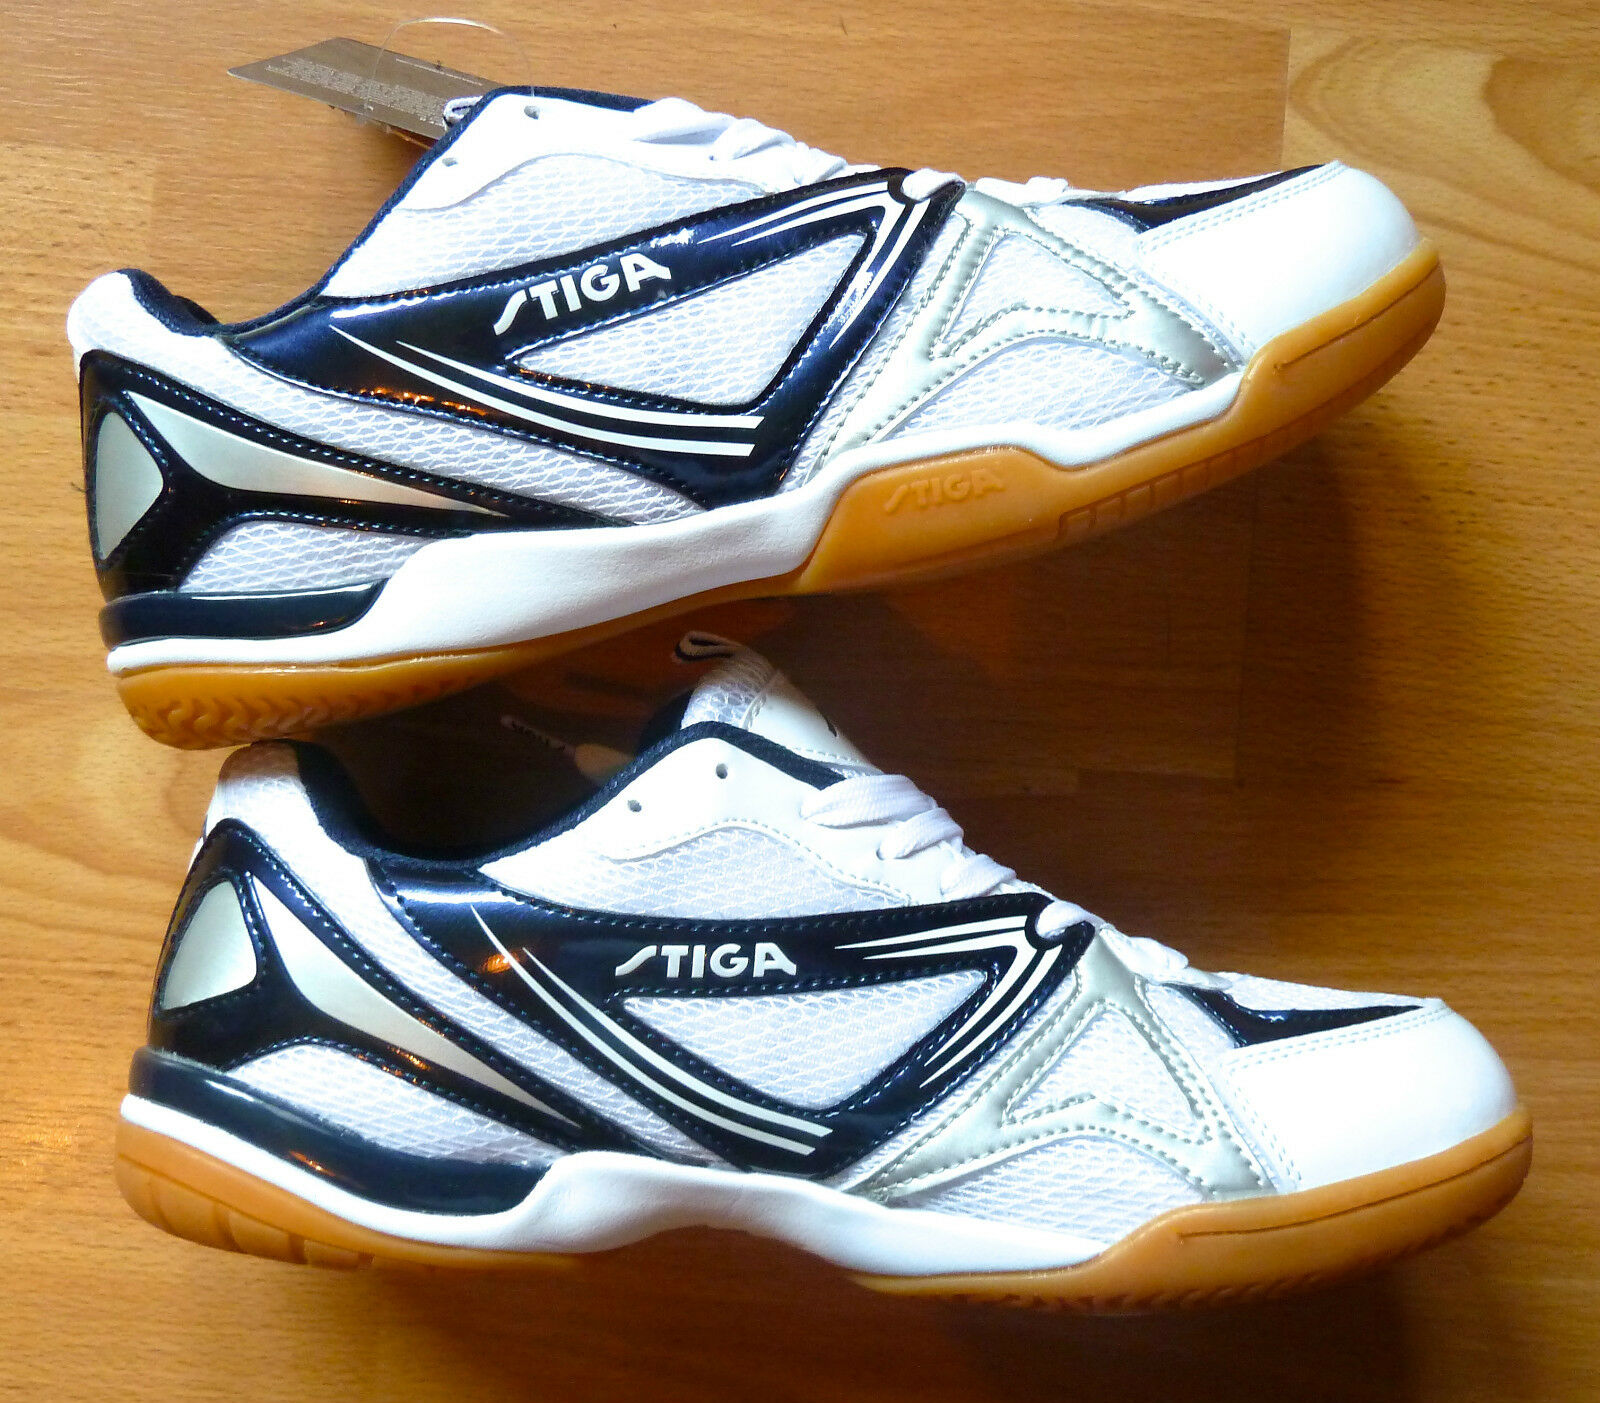 Stiga Instinct 2 Zapatos tenis de mesa – Nuevo (tamaño 6-11)